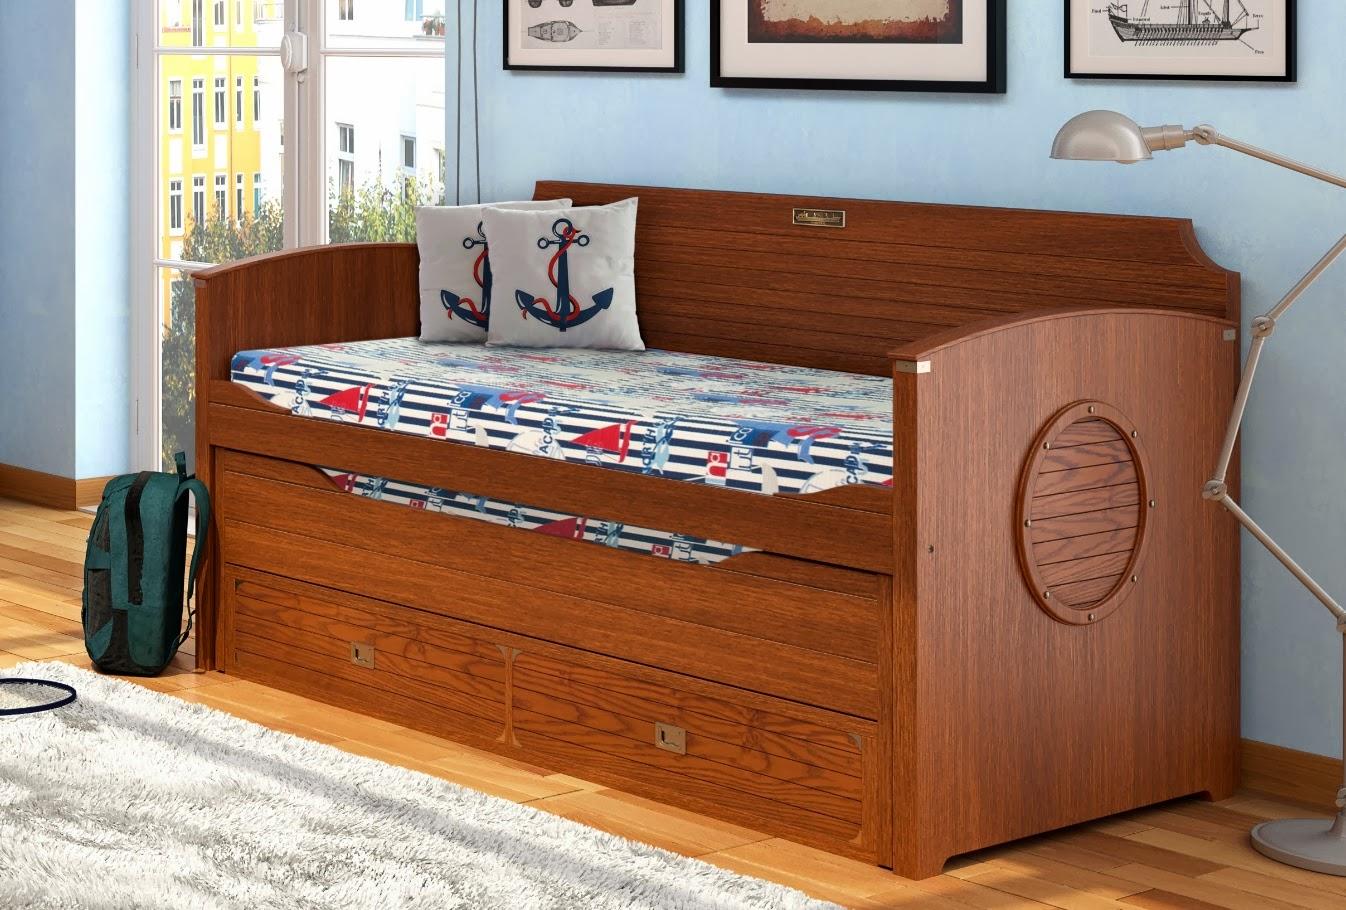 Blog de mbar muebles dormitorios estilo barco - Cama nido barco ...